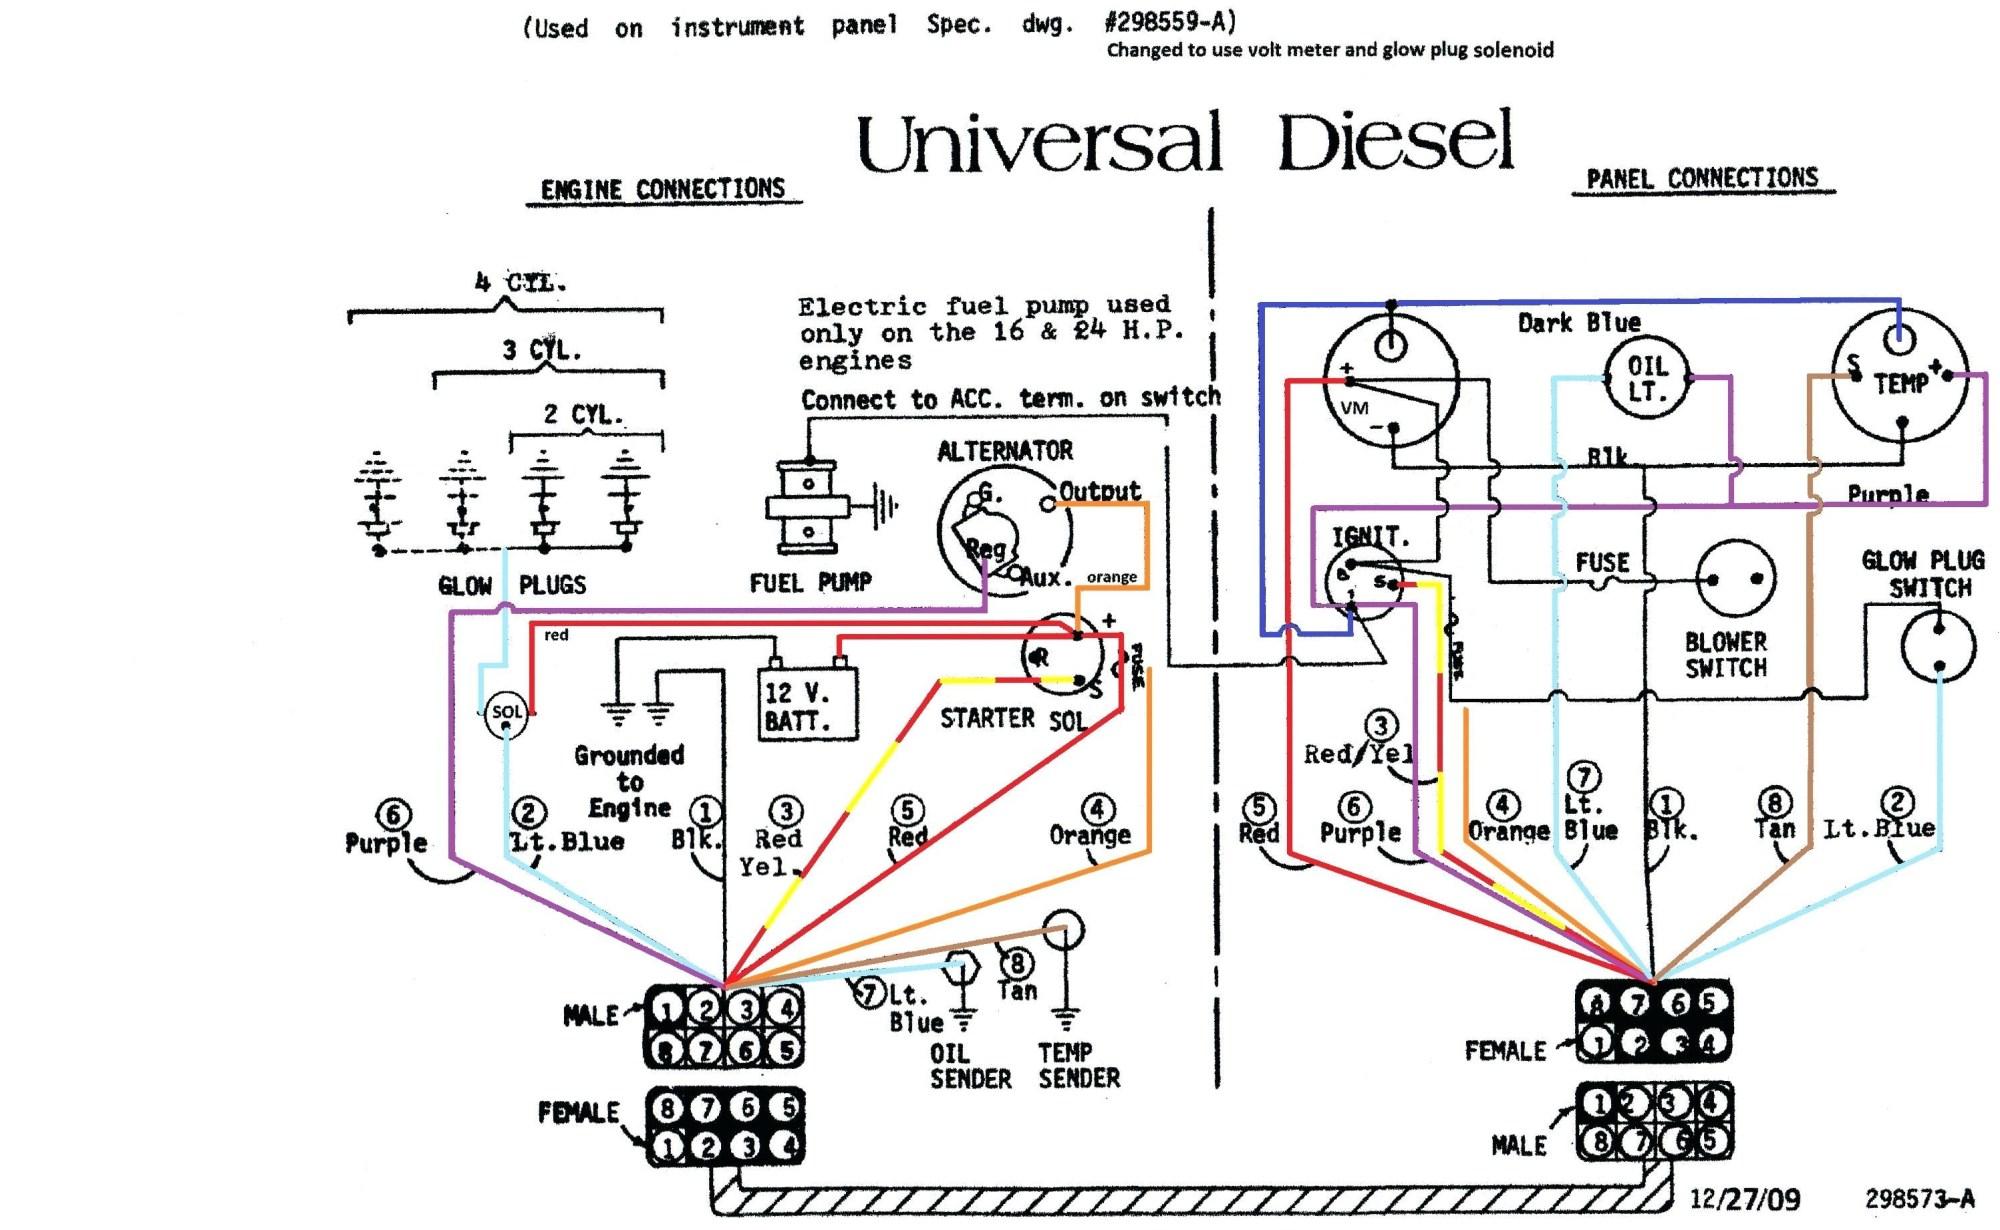 hight resolution of engine wiring basics wiring diagram for you basic engine wiring diagram